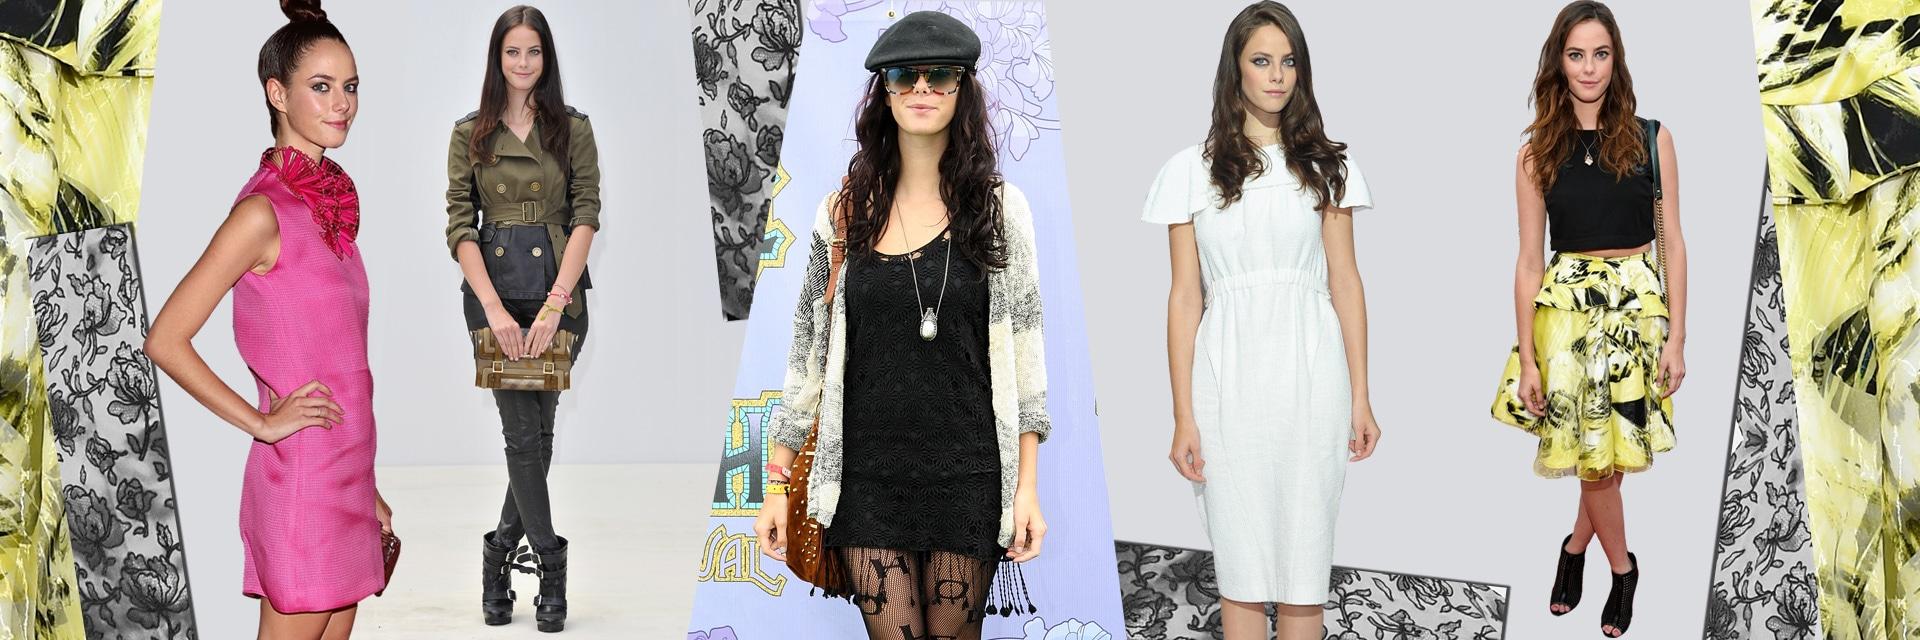 Kaya Scodelario: nuova fashion icon in arrivo